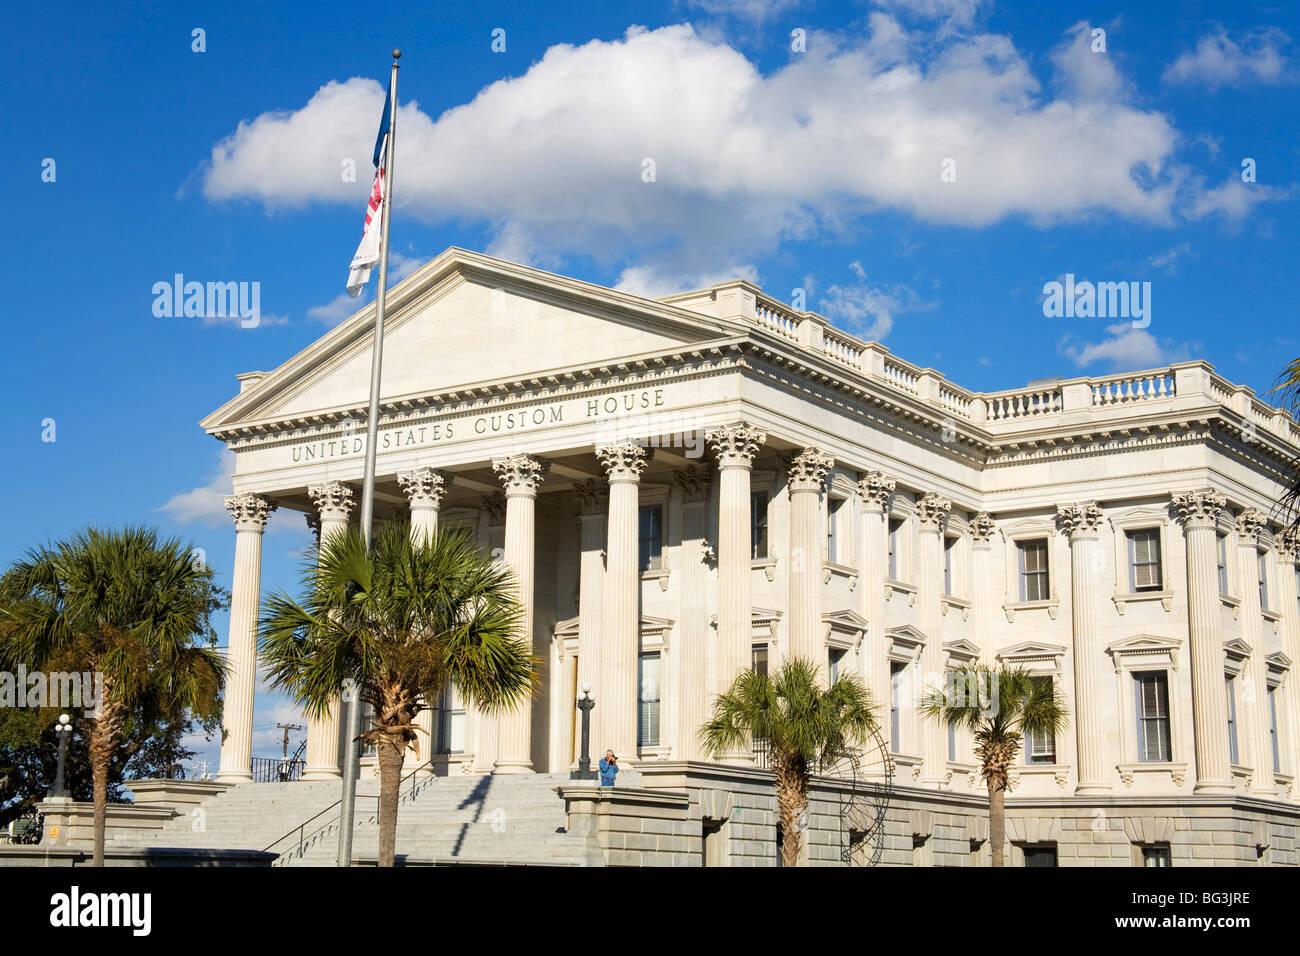 United States Custom House, Charleston, South Carolina, United States of America, North America - Stock Image